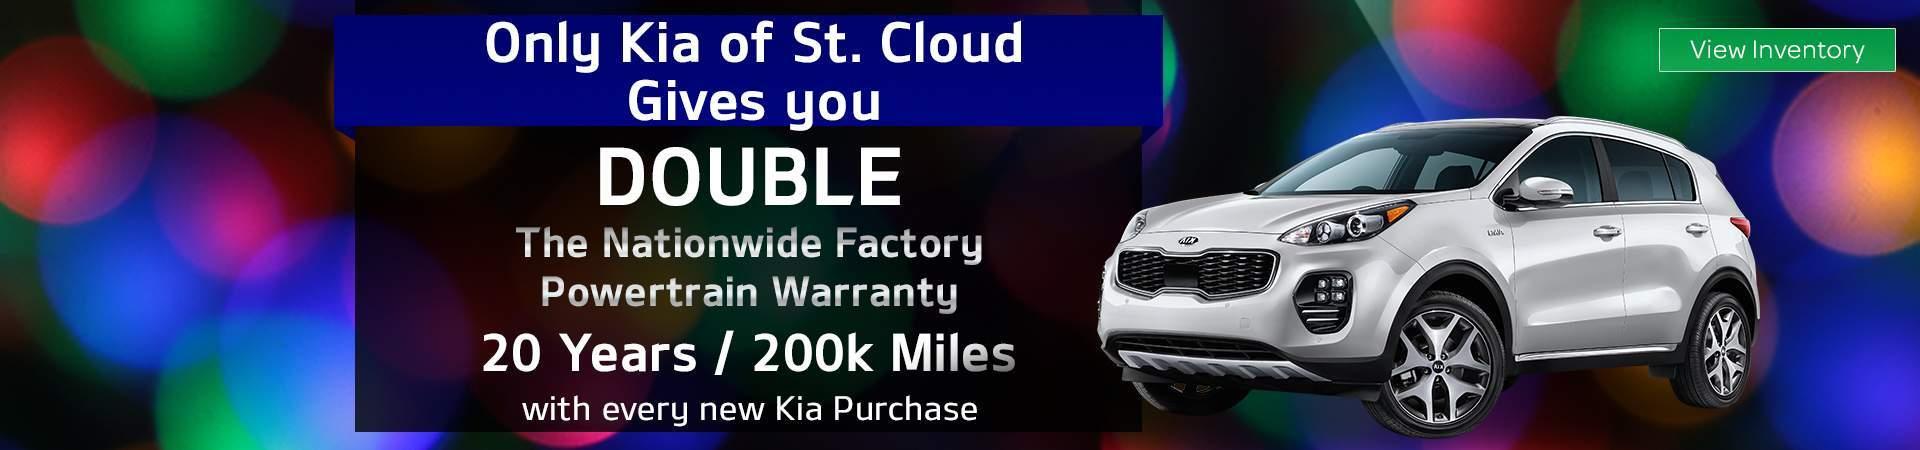 Exceptional Warranty